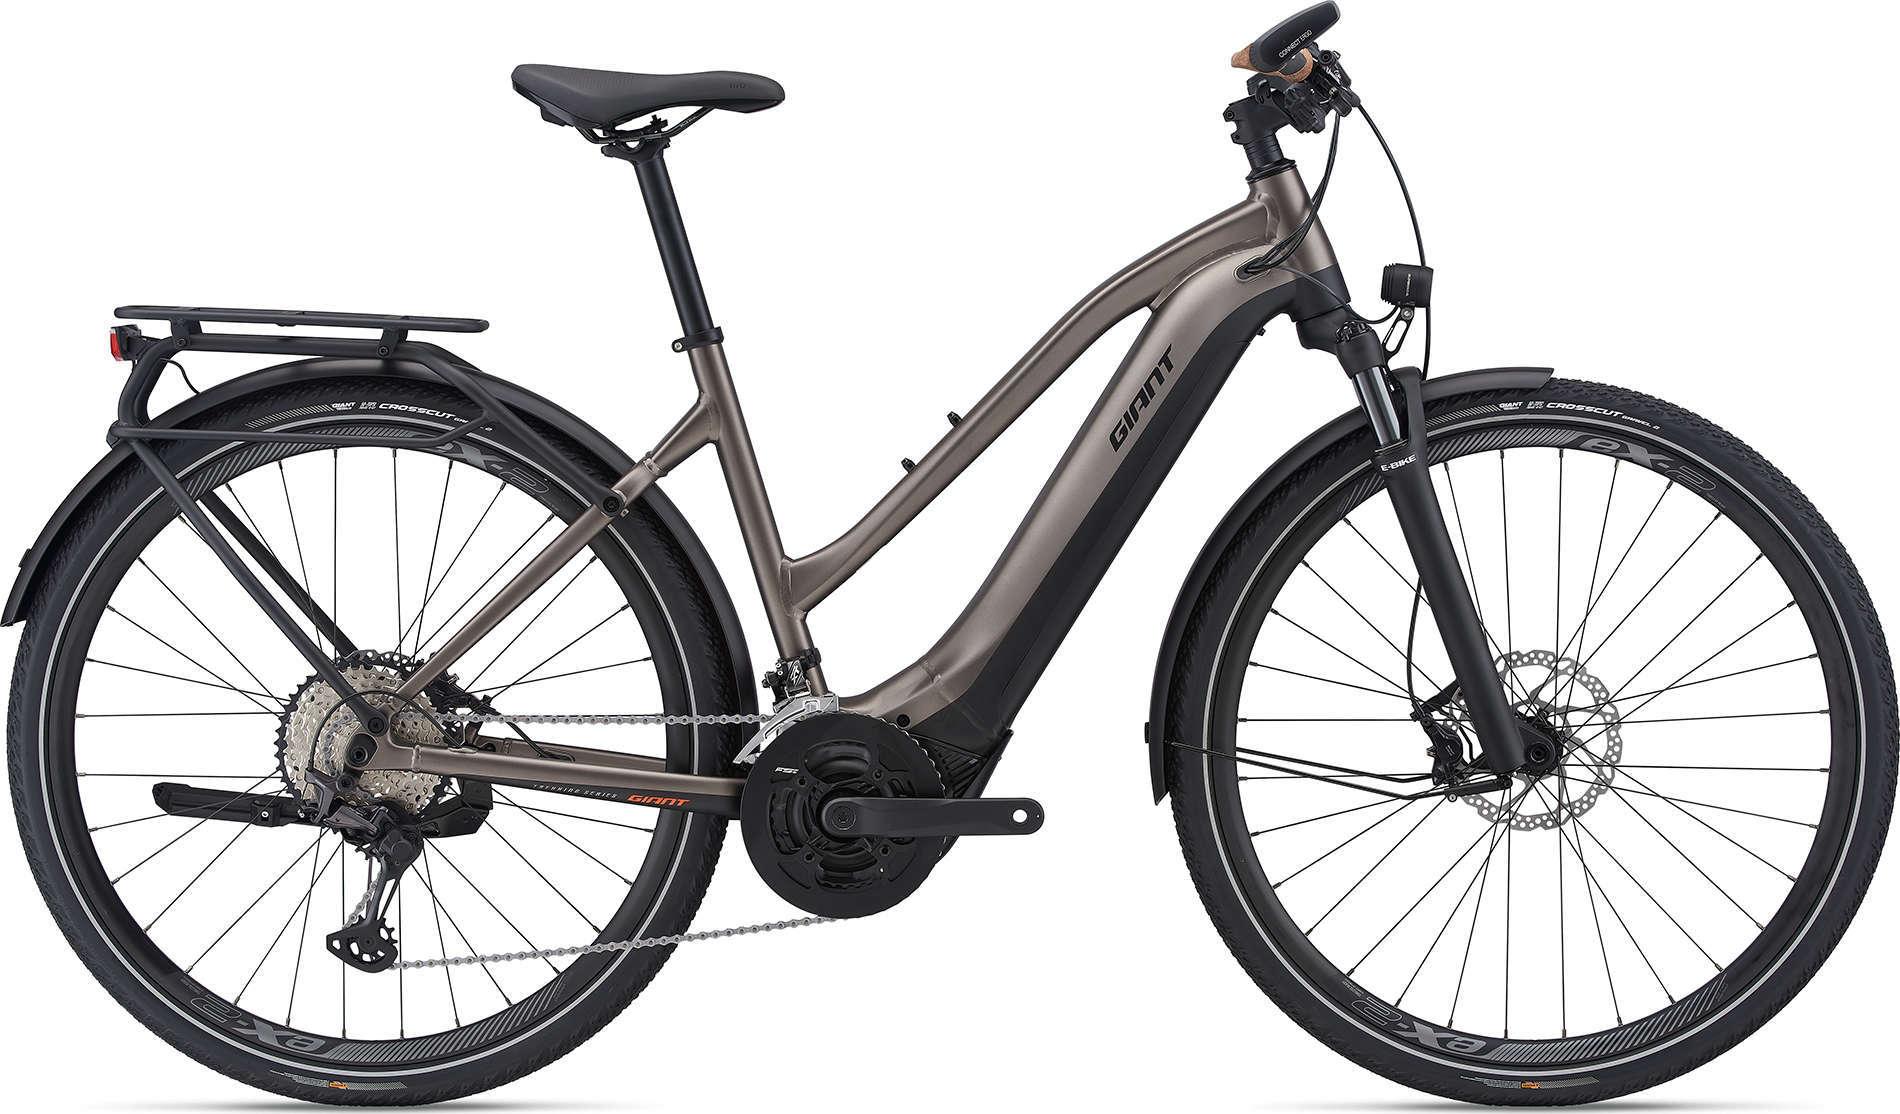 GIANT Explore E+ 0 Pro STA férfi trekking pedelec kerékpár - M (2021)